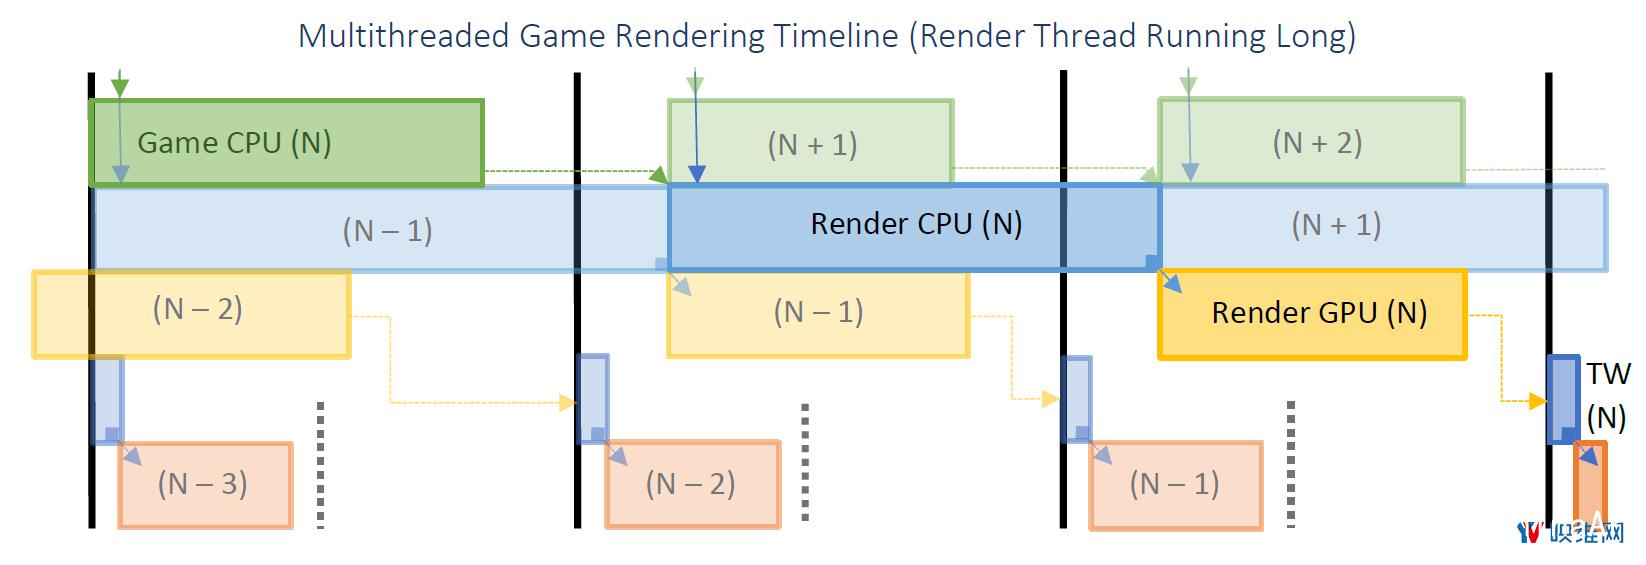 Oculus详述『延迟』问题及对应『帧渲染』解决方案 资源教程 第9张